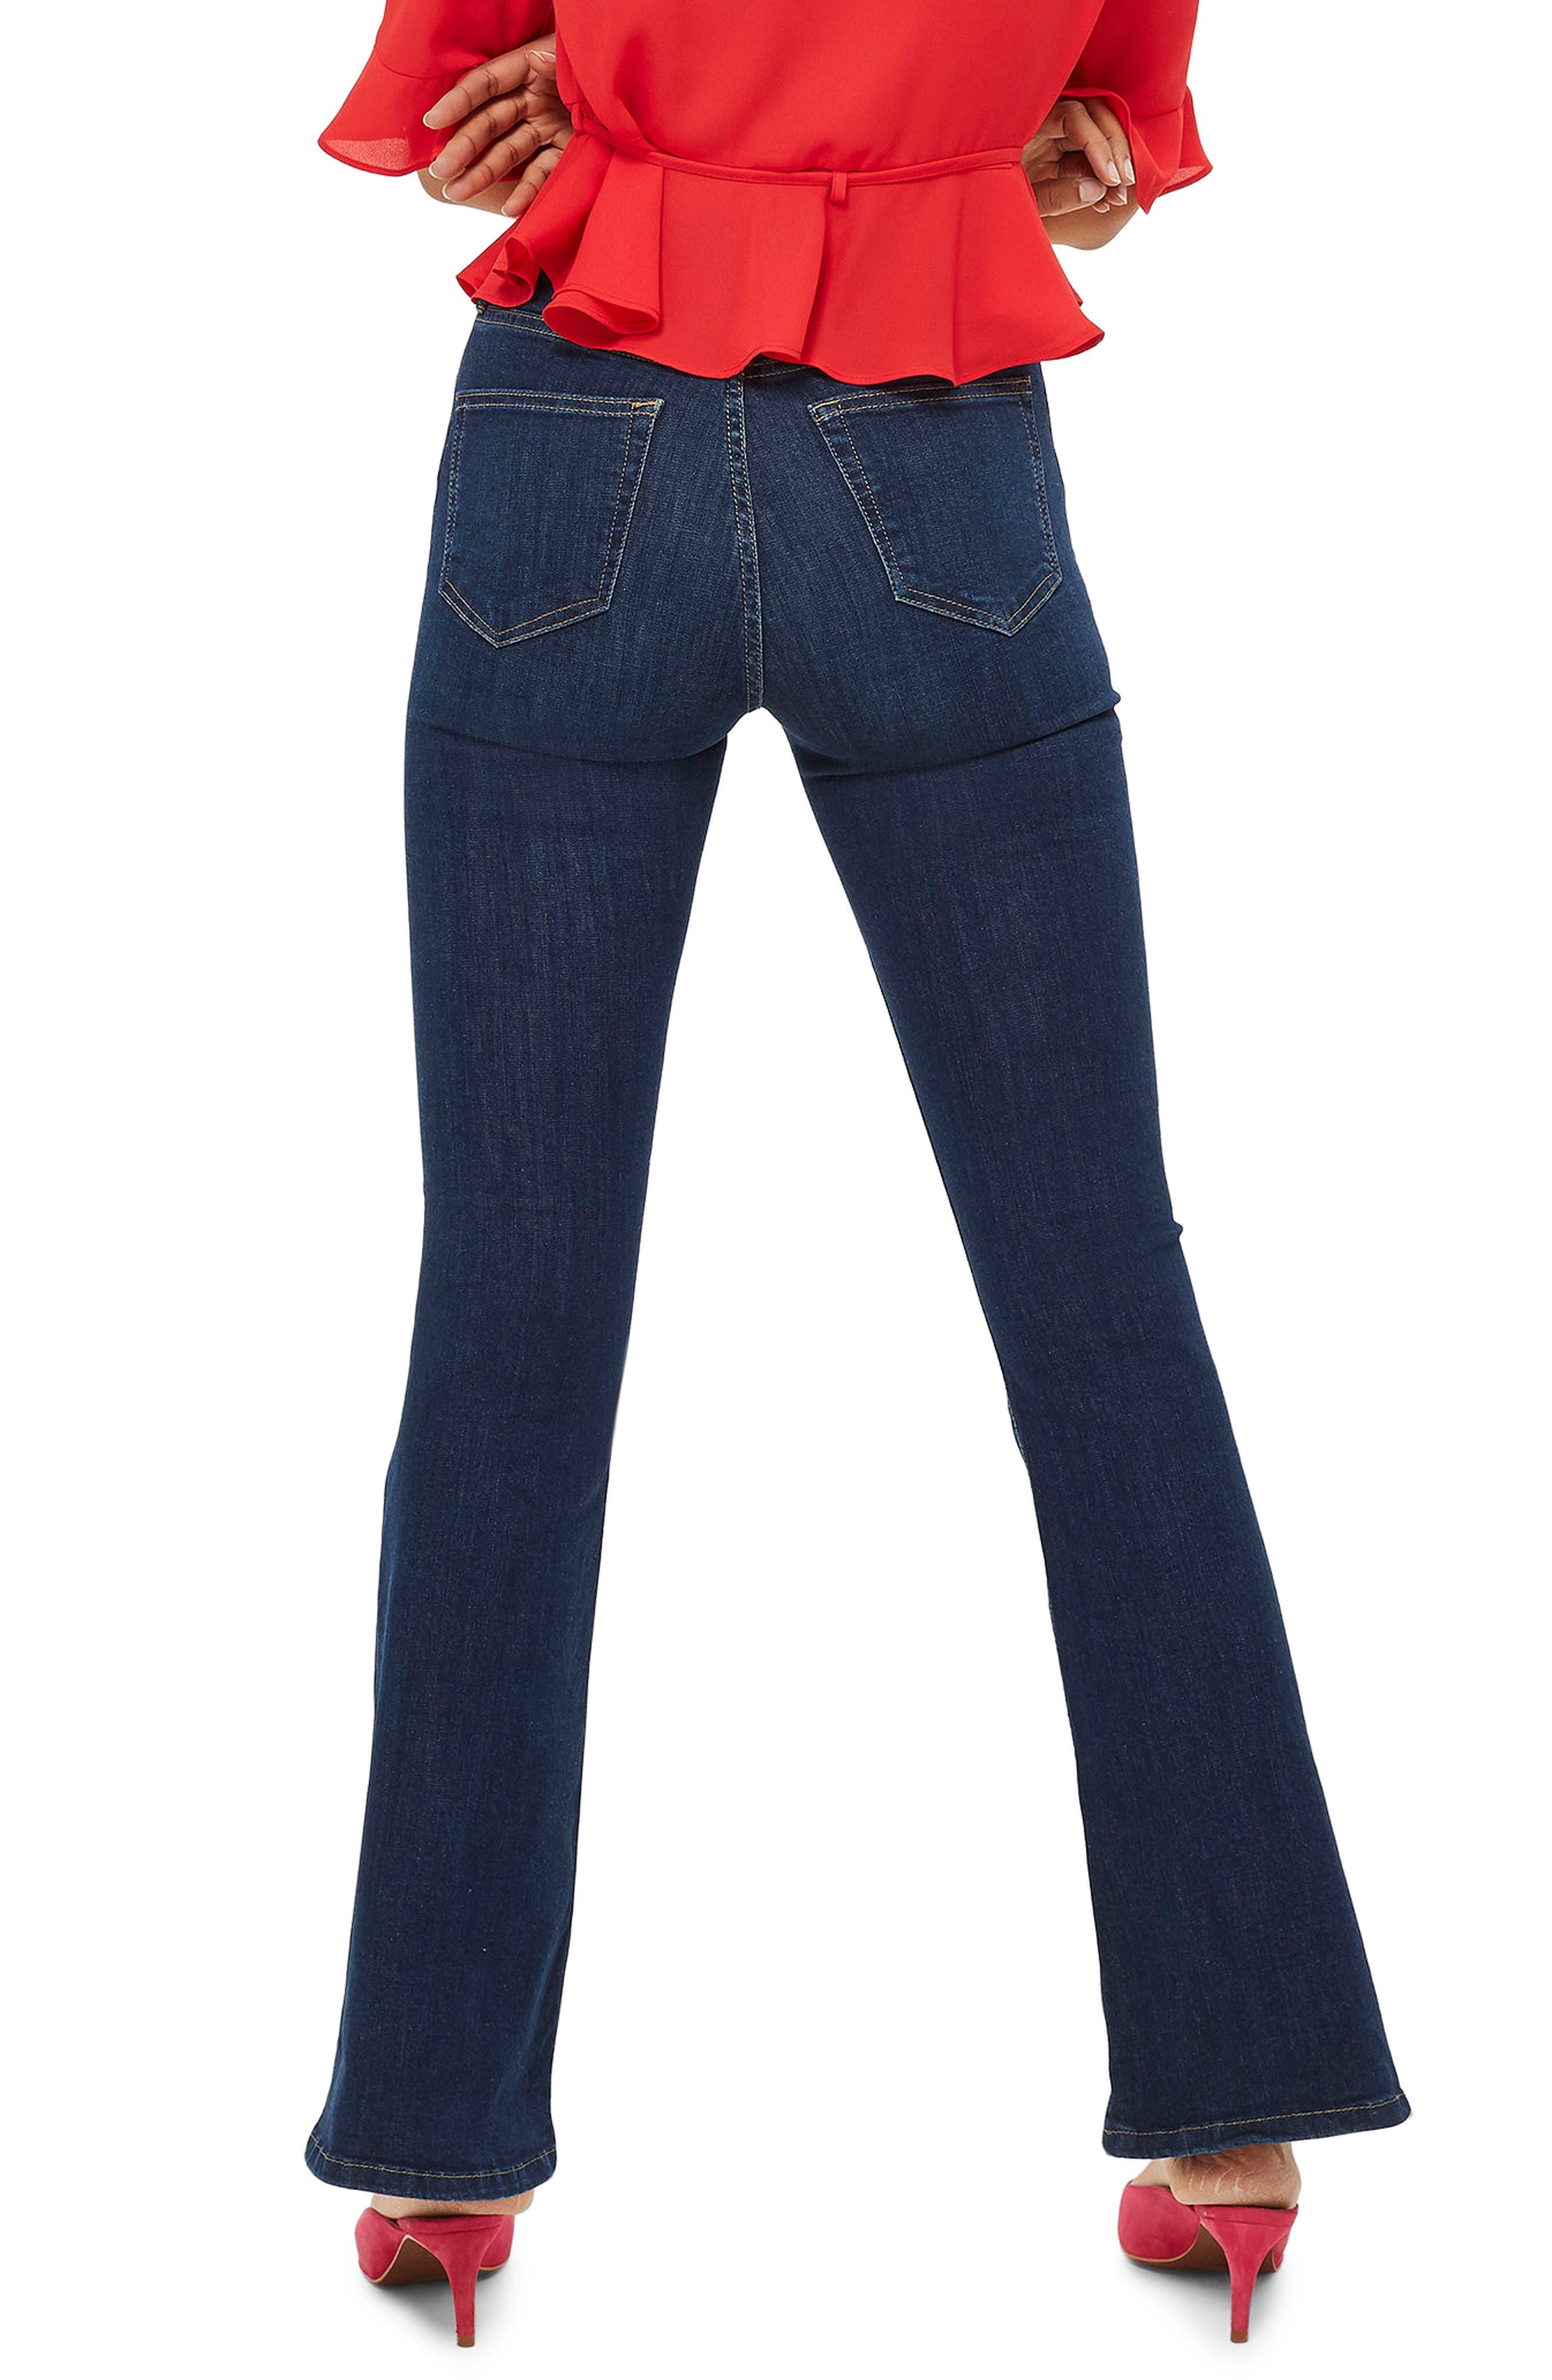 Jamie Petite Flared Jeans,                             Alternate thumbnail 2, color,                             MID DENIM